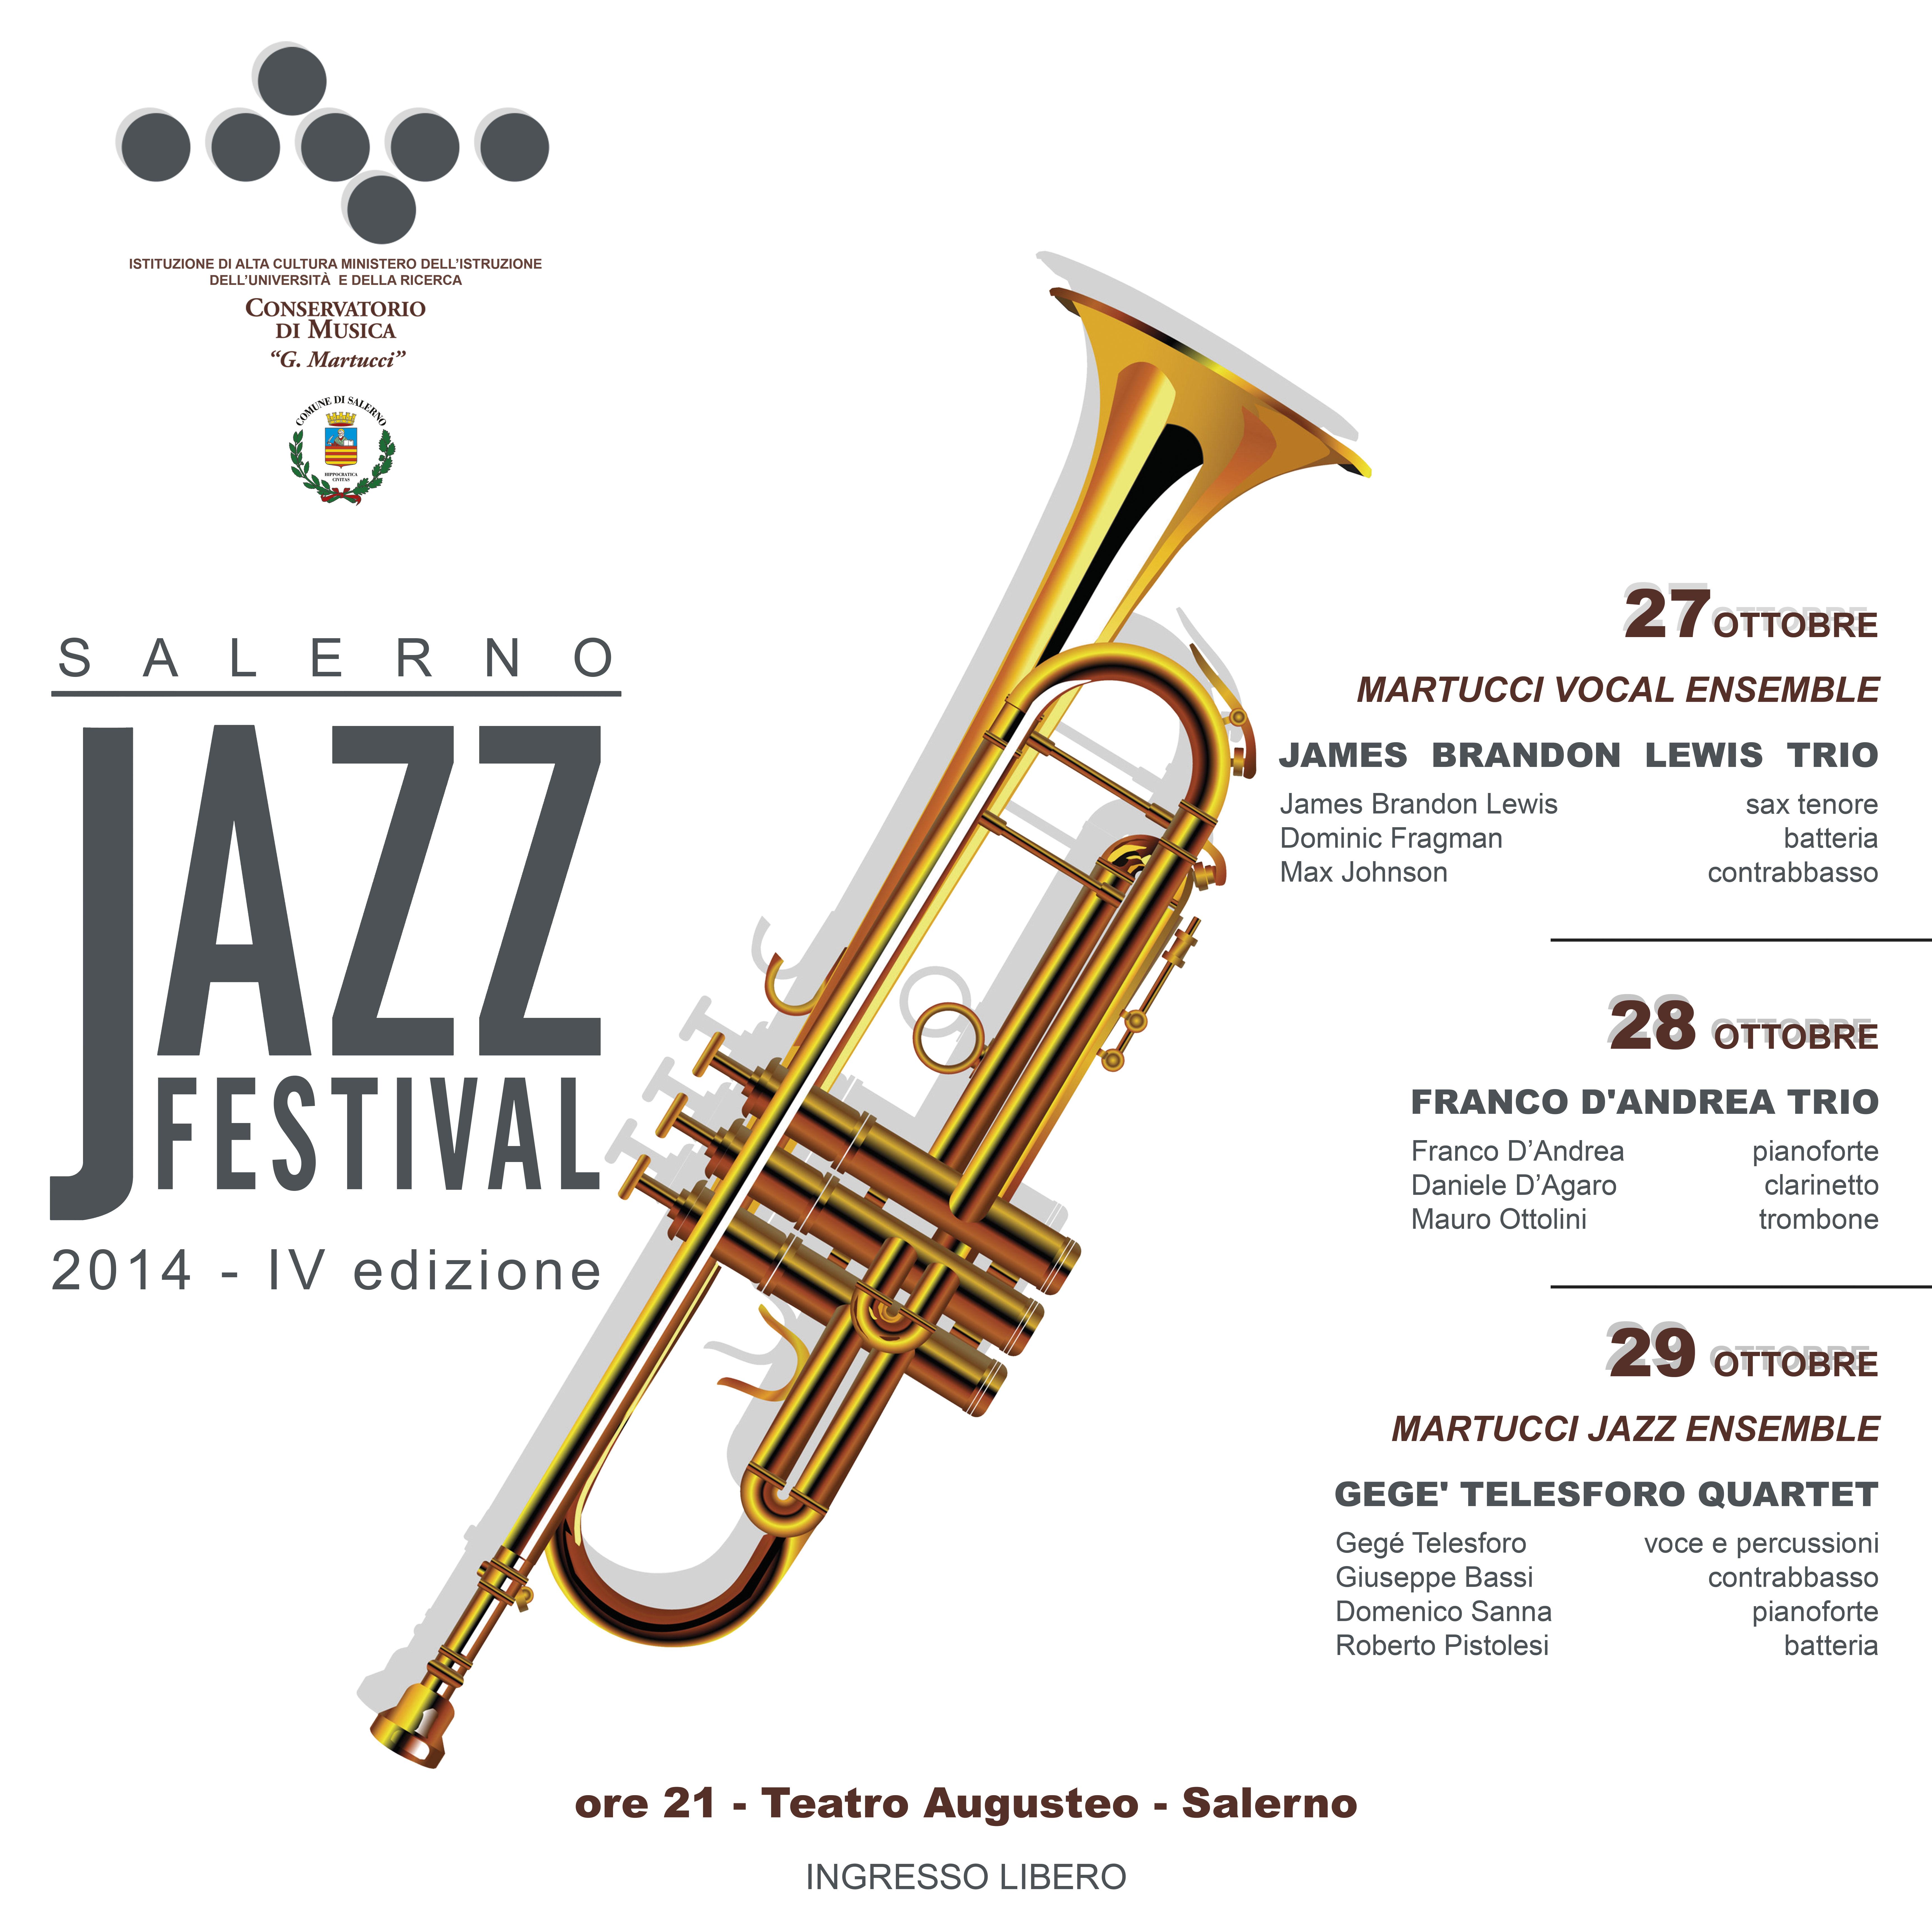 SalernoJazzFestival